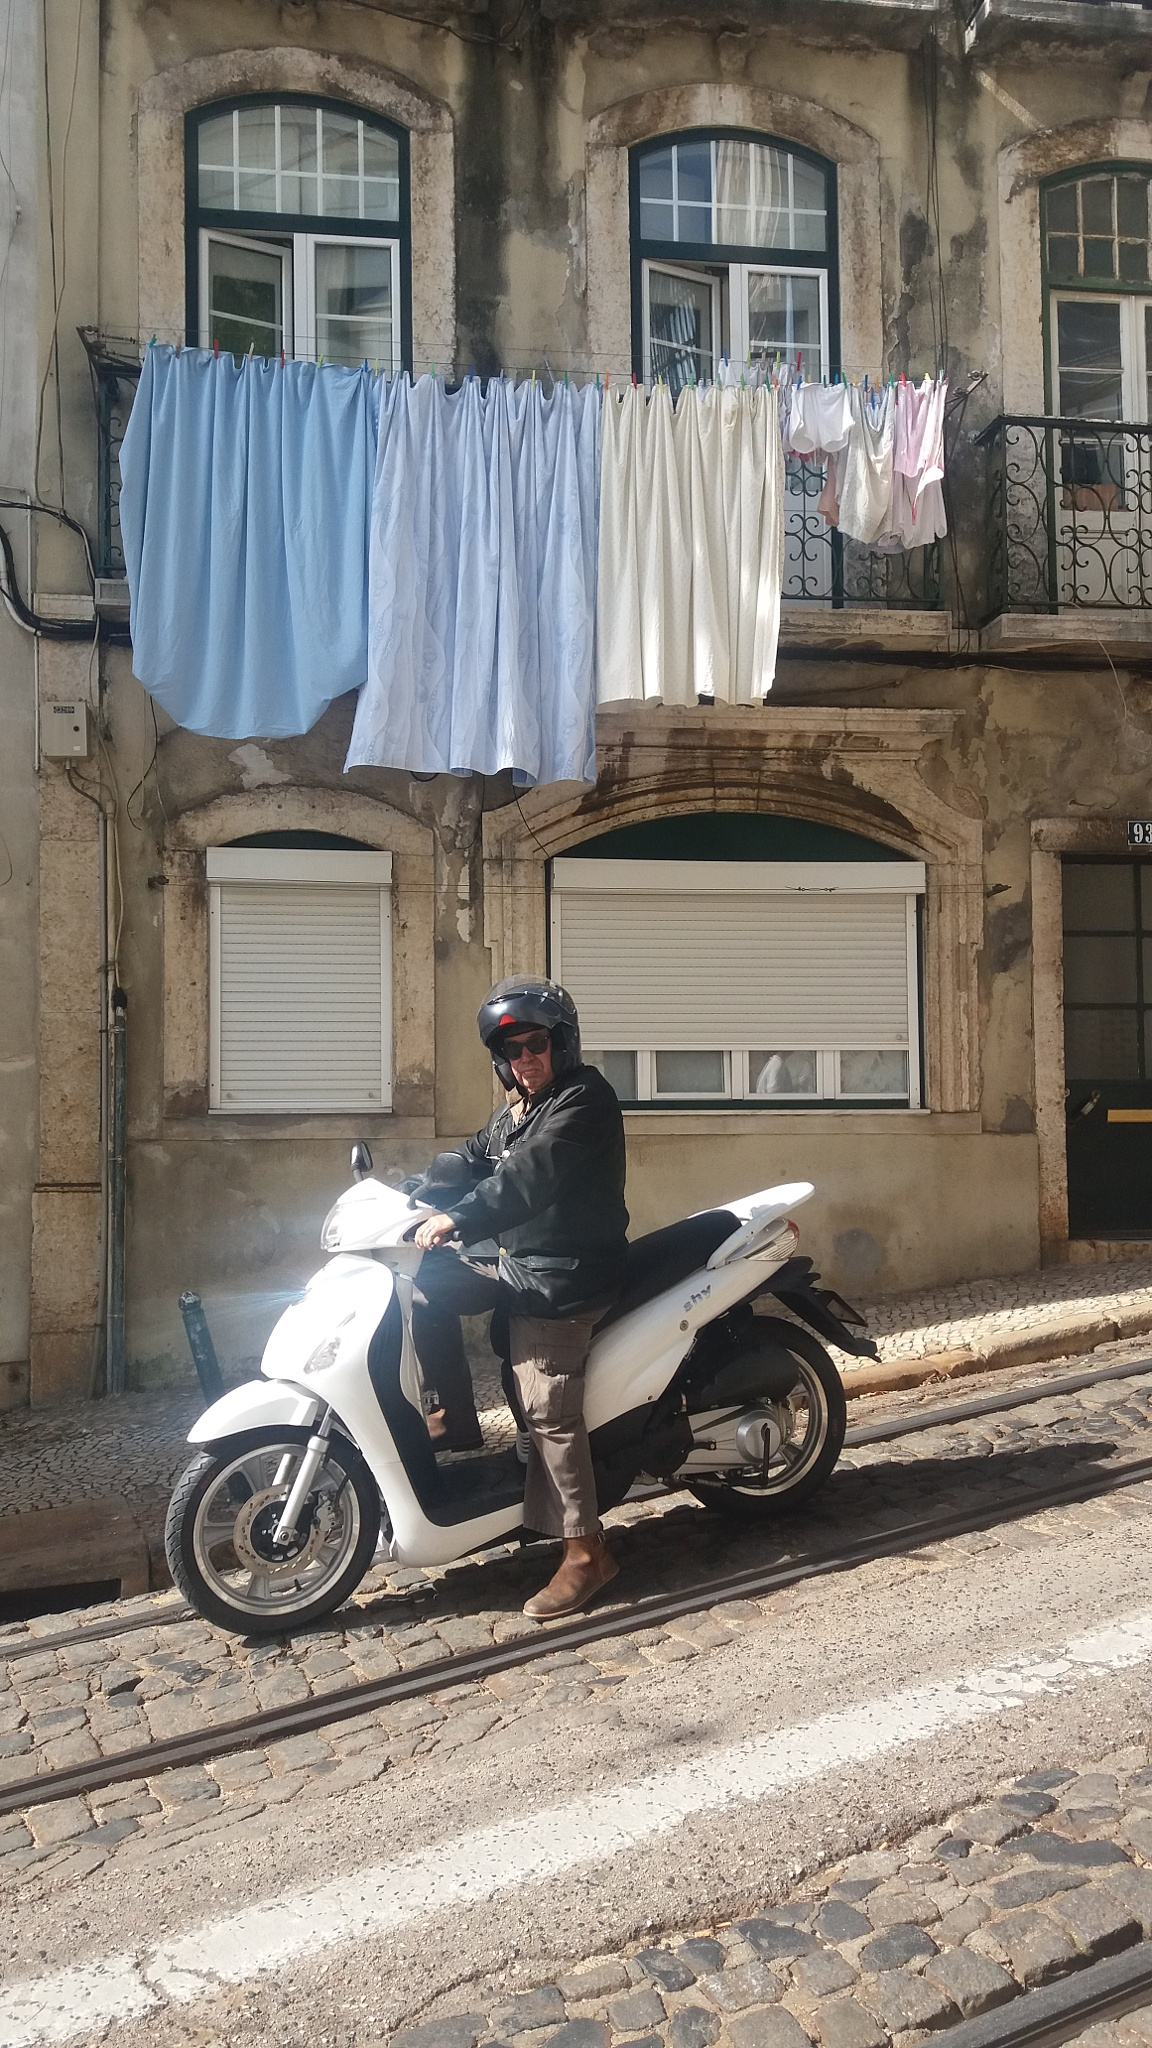 Motorbike man at the traffic lights by Nea Lo